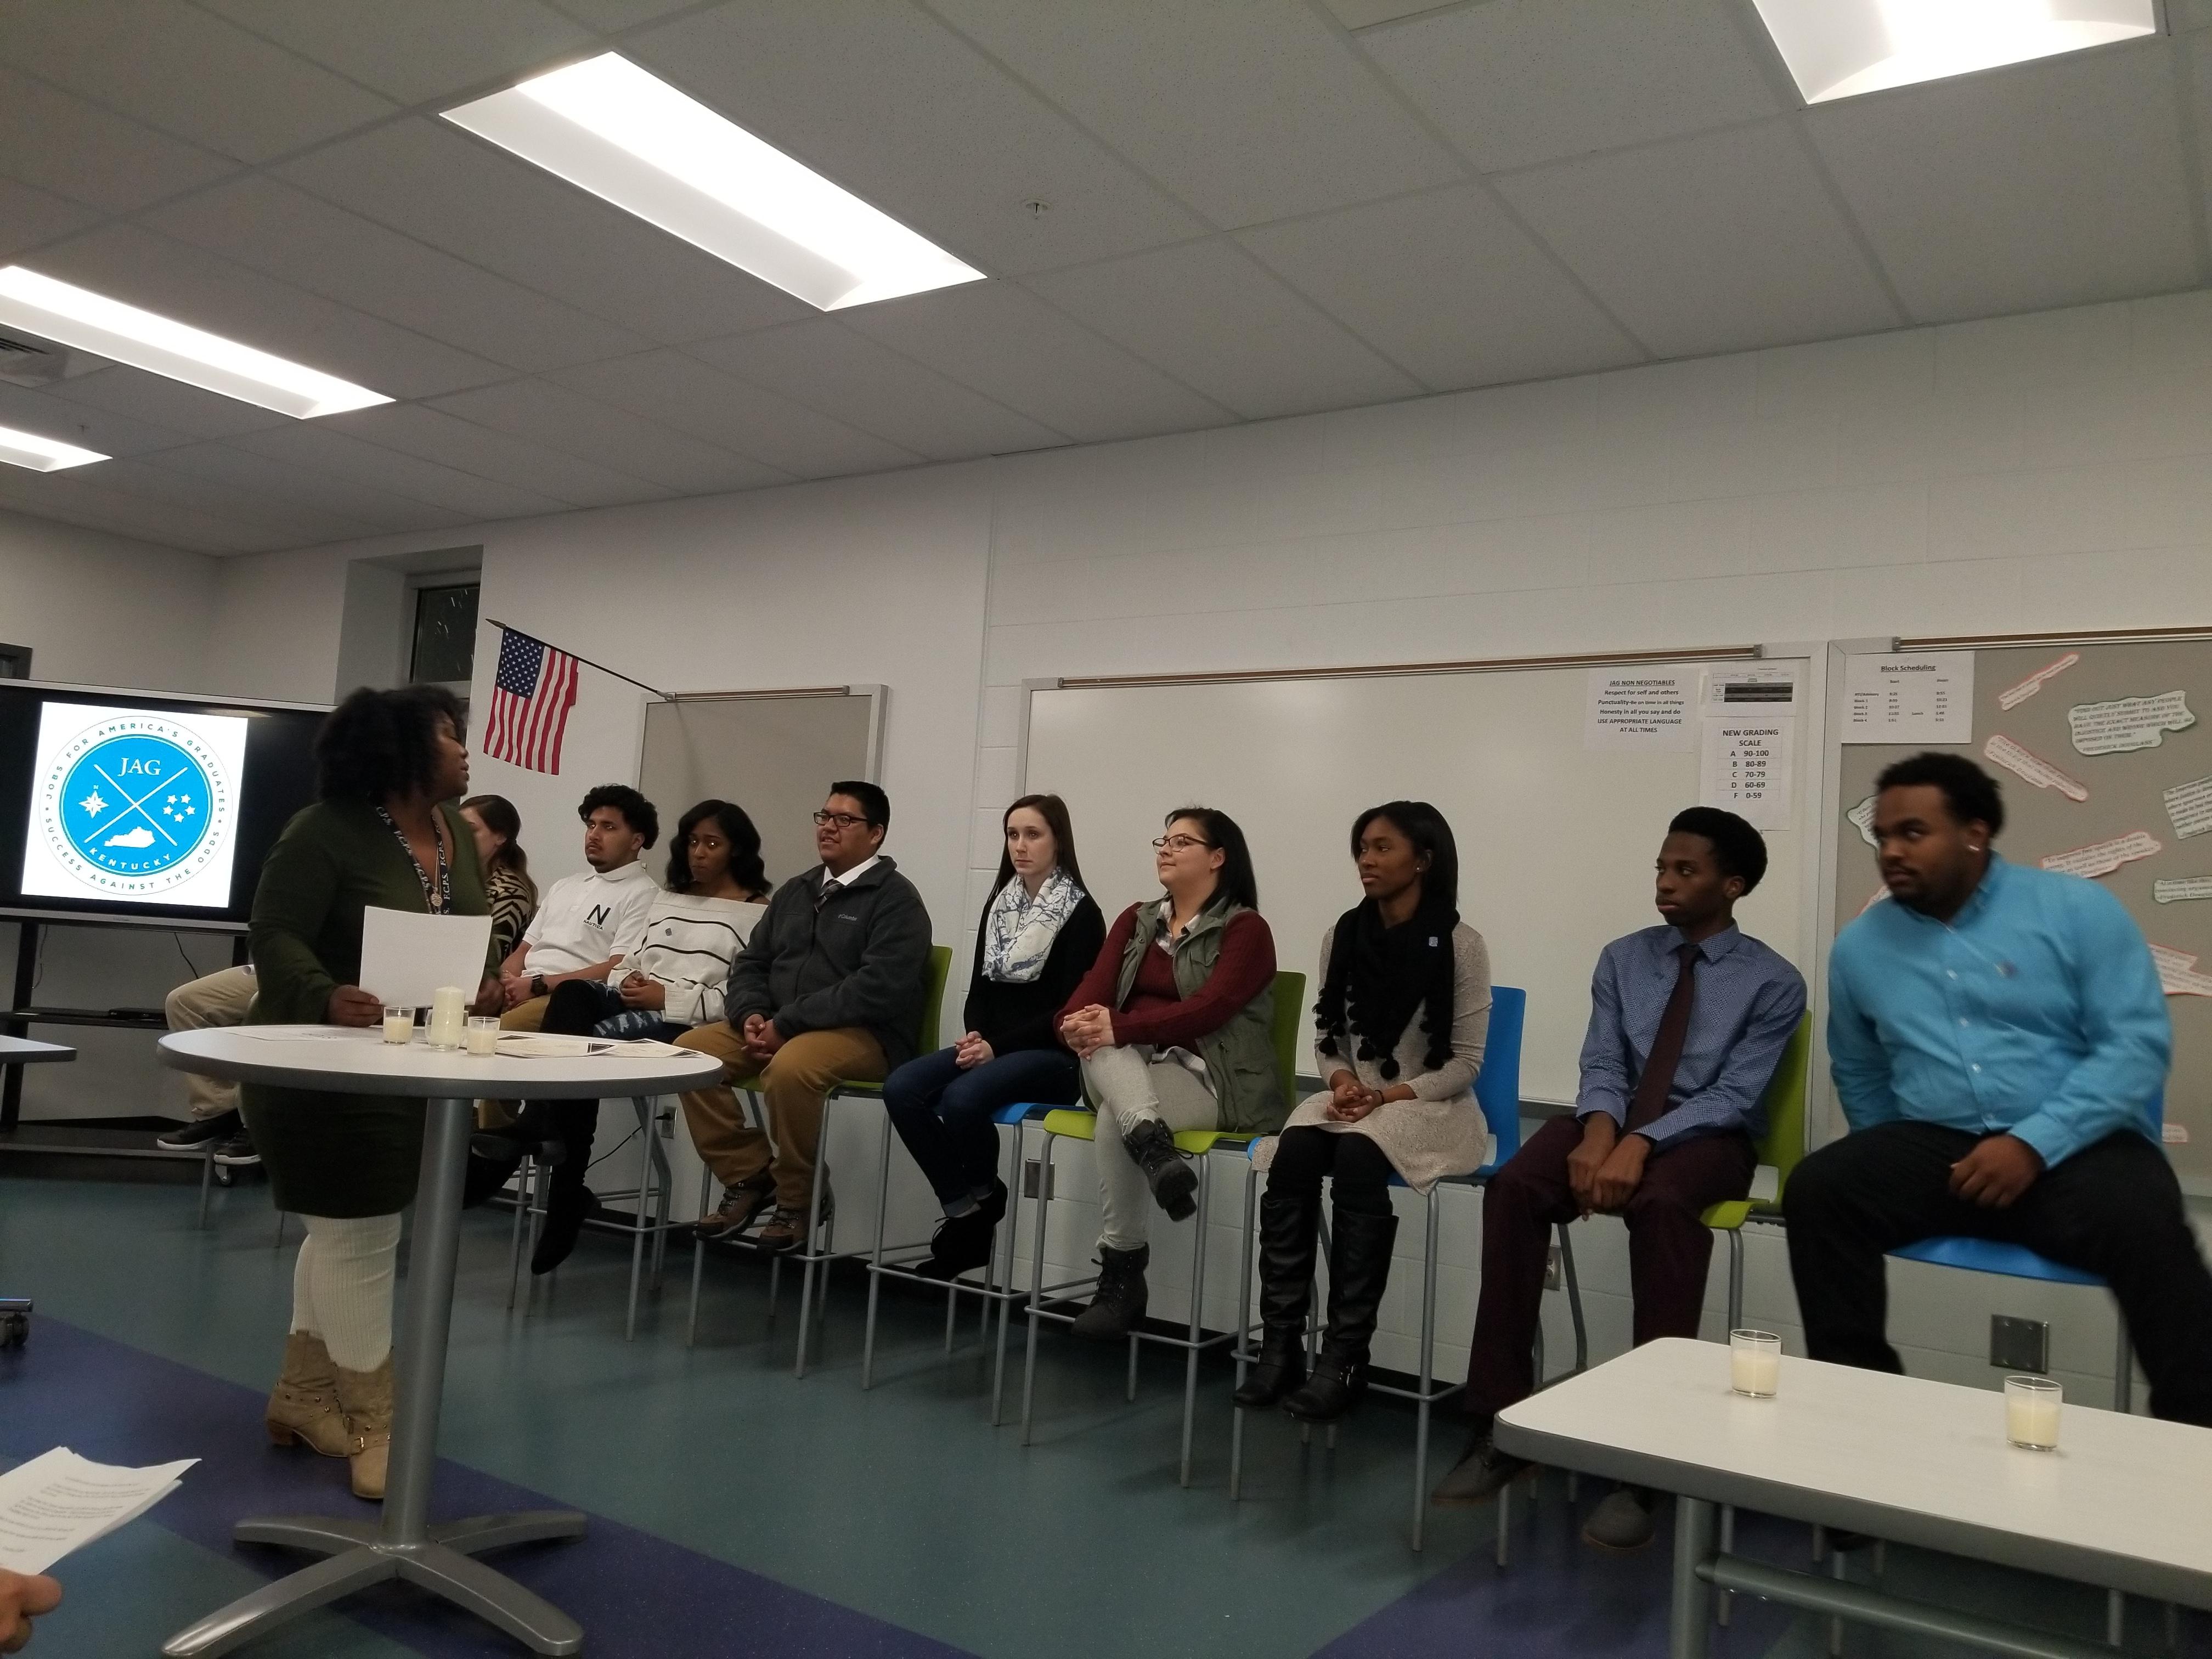 JAG KY Specialist Laranda Smith Opens Frederick Douglas I&I Ceremony